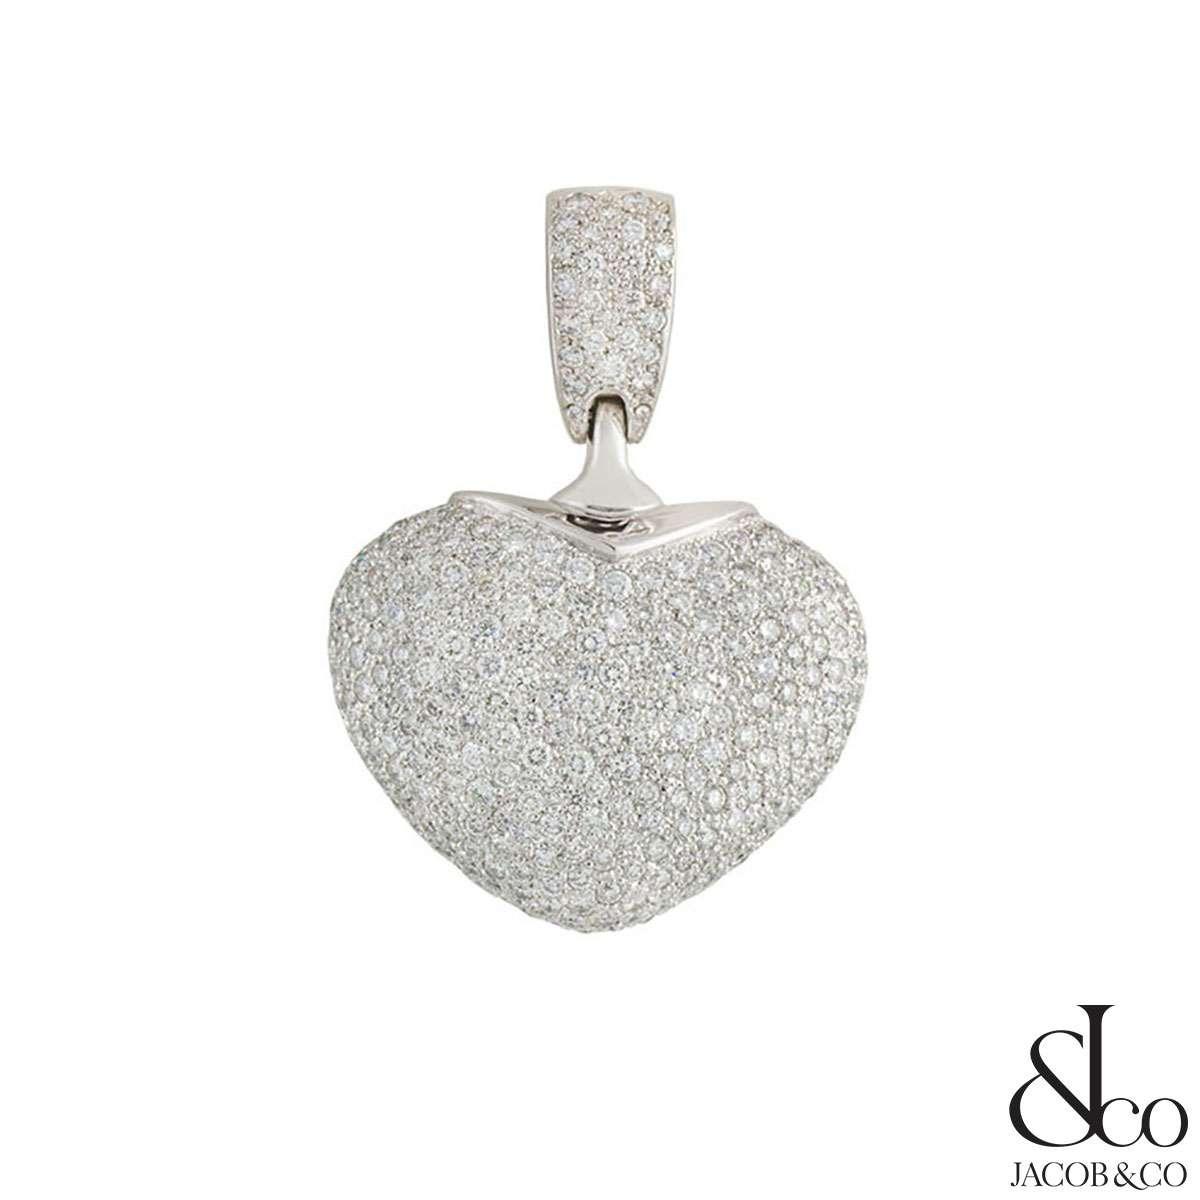 Jacob & Co 14k White Gold Diamond Heart Pendant